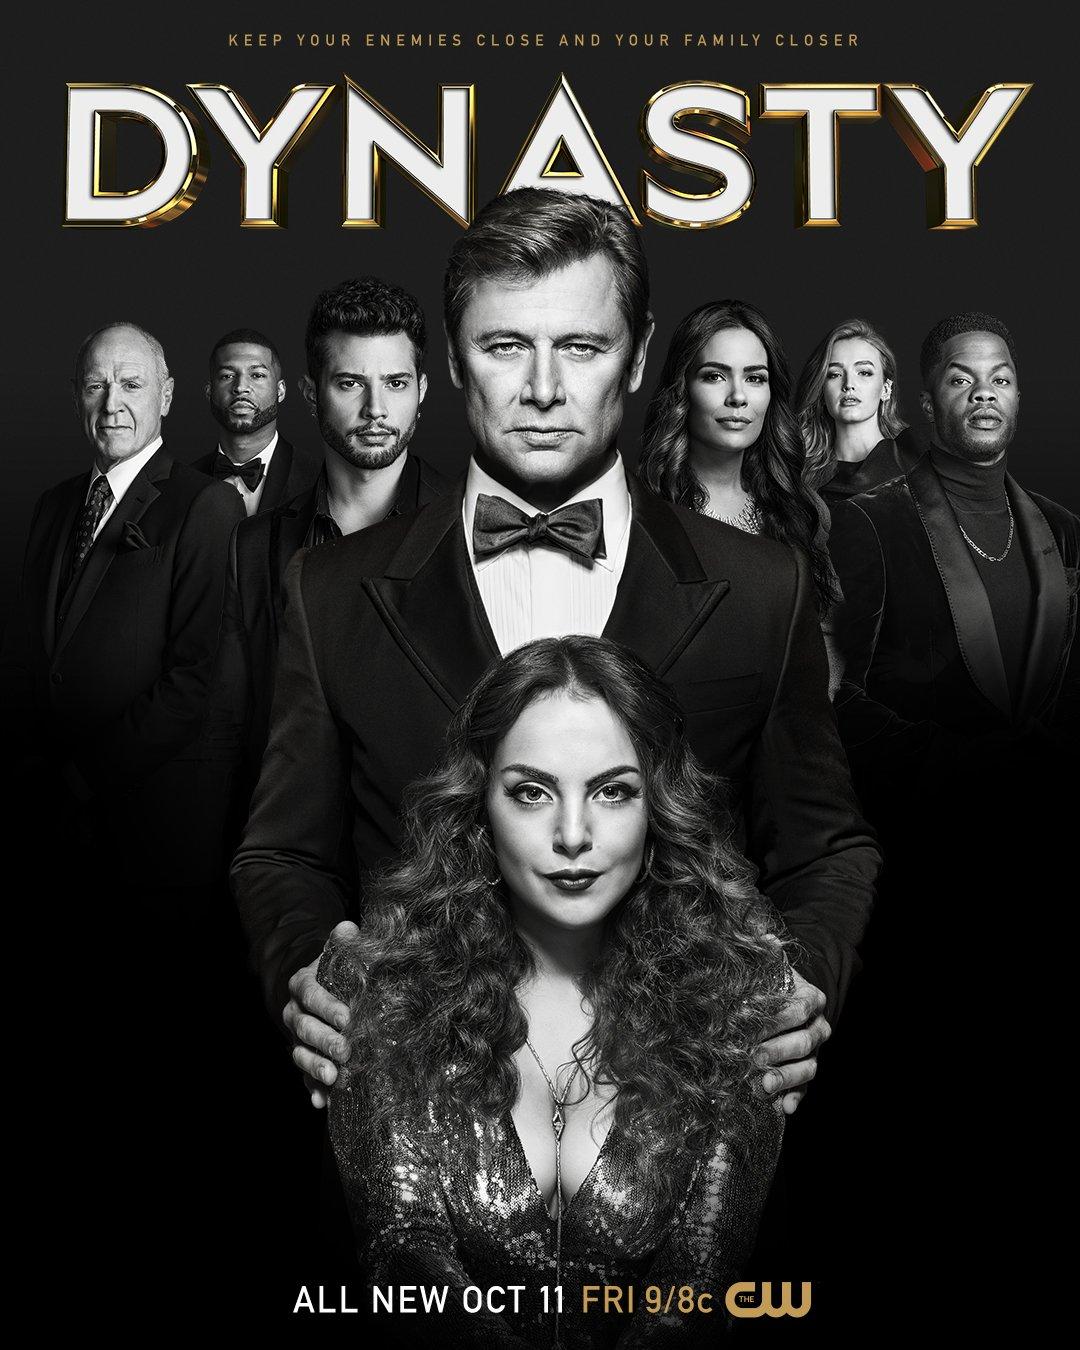 Dynasty.2017.S03E13.MULTi.1080p.WEB.x264-CiELOS